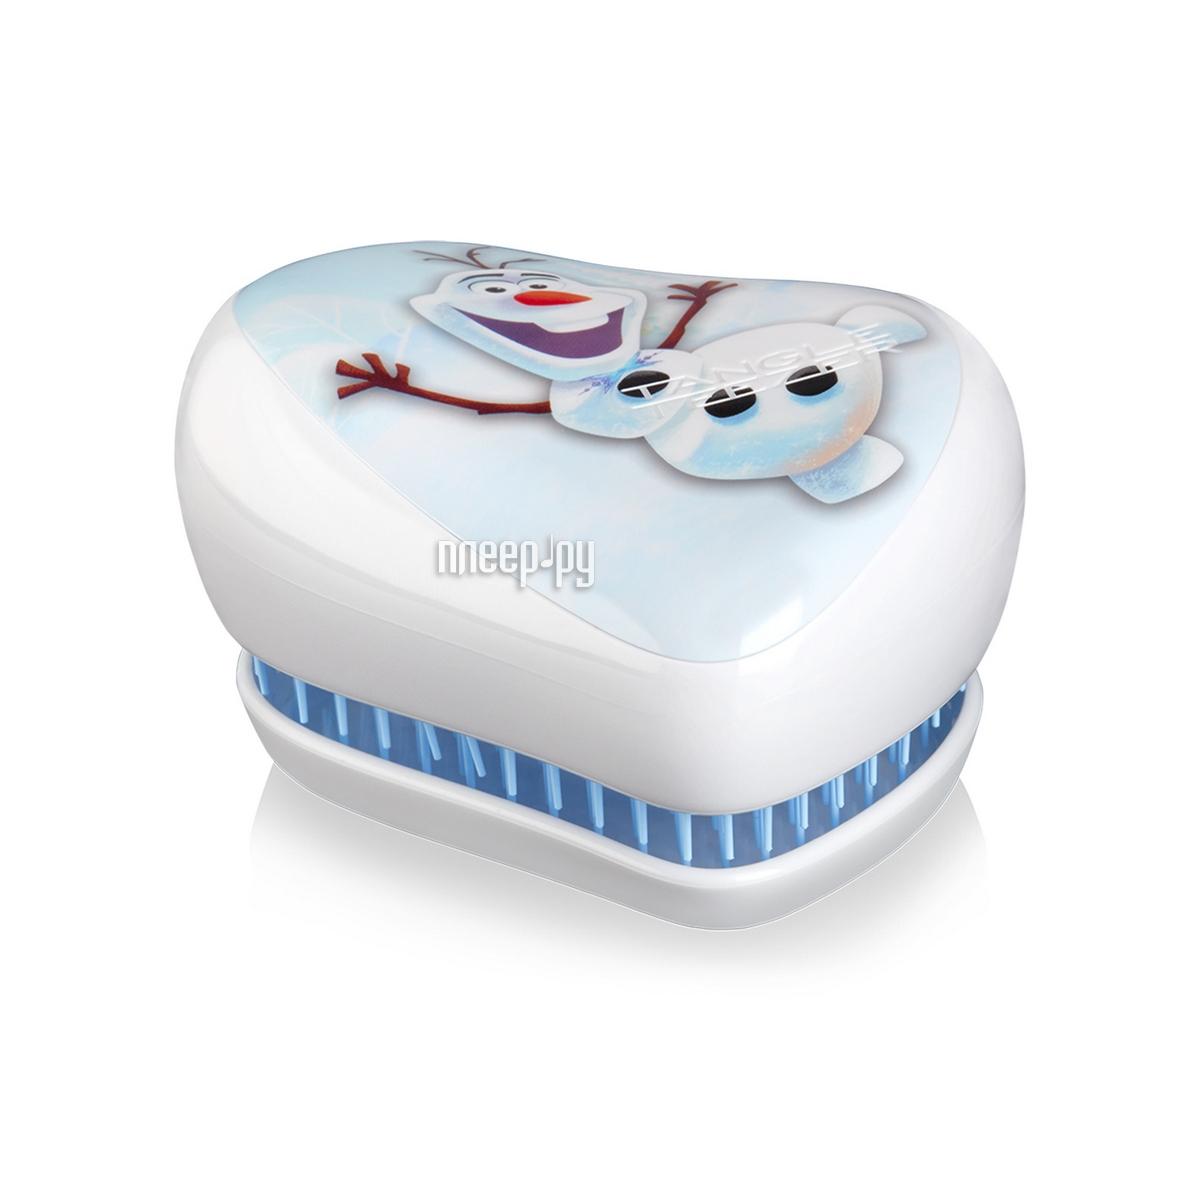 Расческа Tangle Teezer Compact Styler Disney Olaf